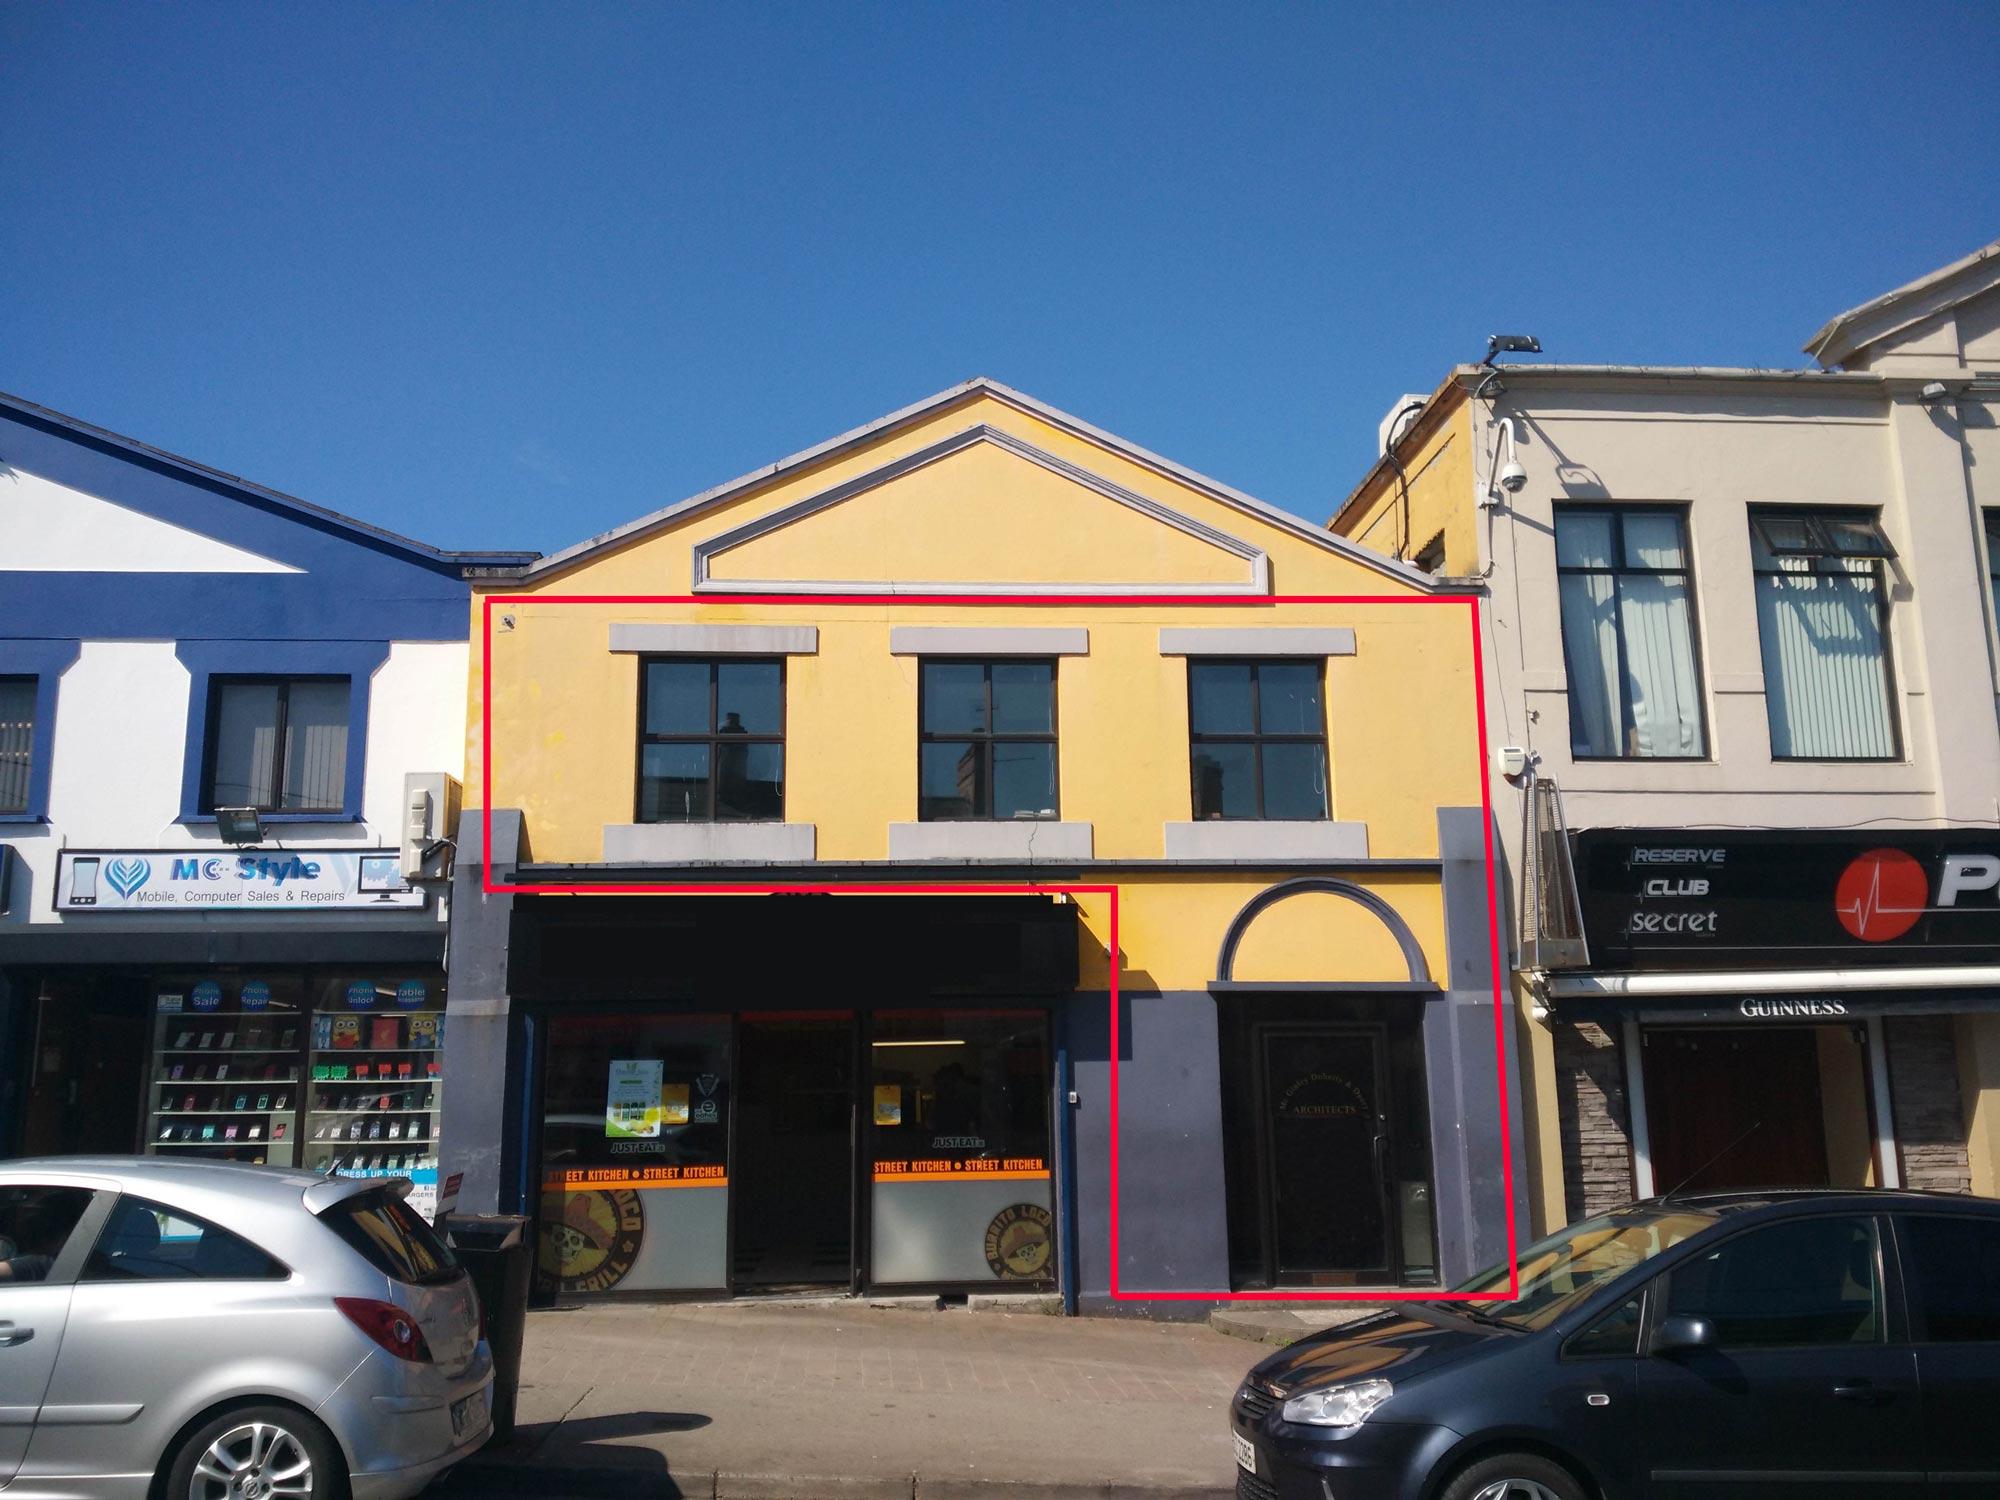 Port Road, Letterkenny, Co. Donegal